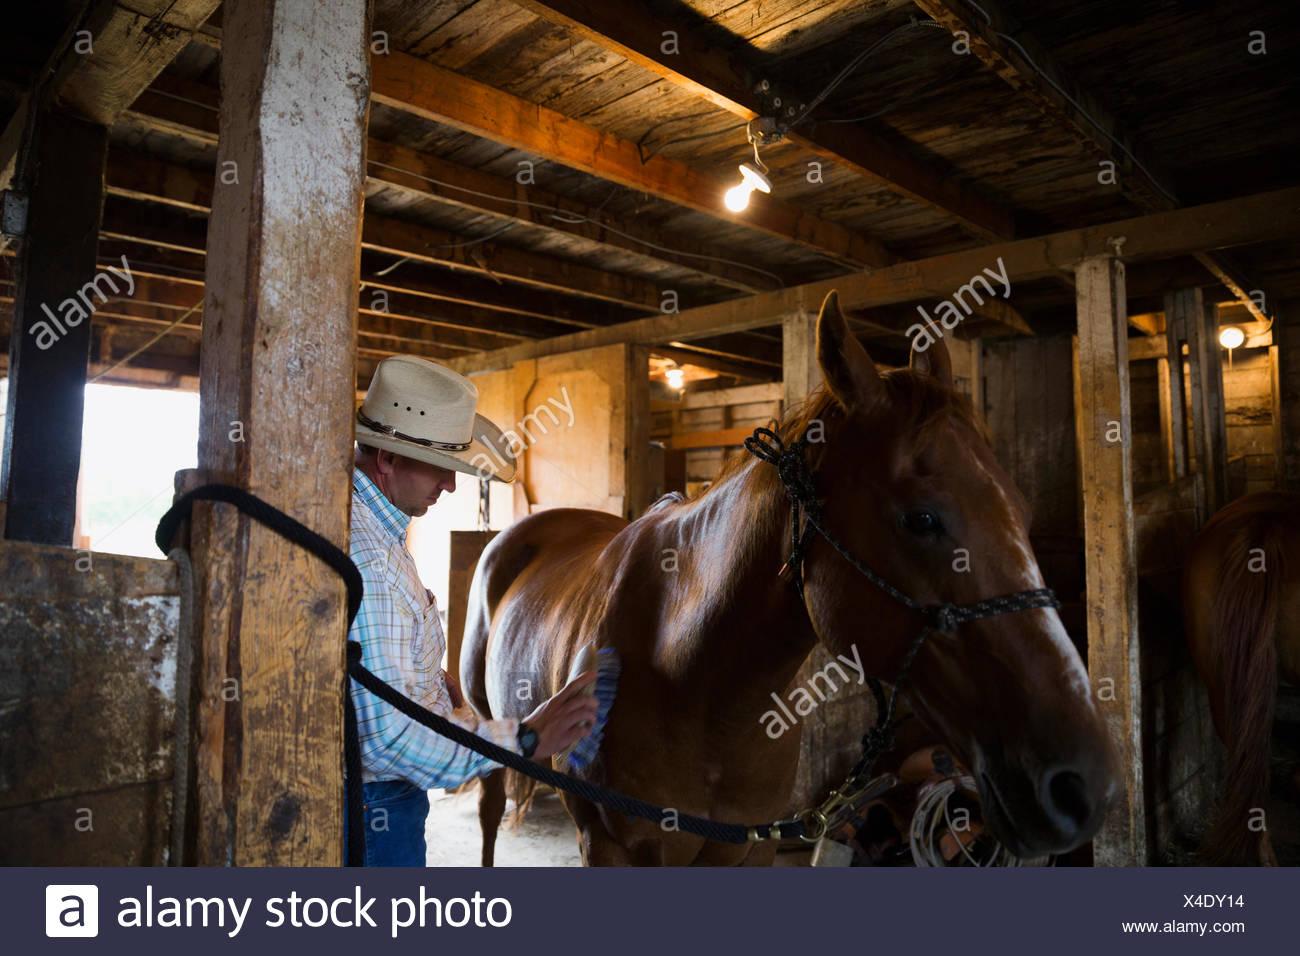 Rancher brushing horse in barn - Stock Image